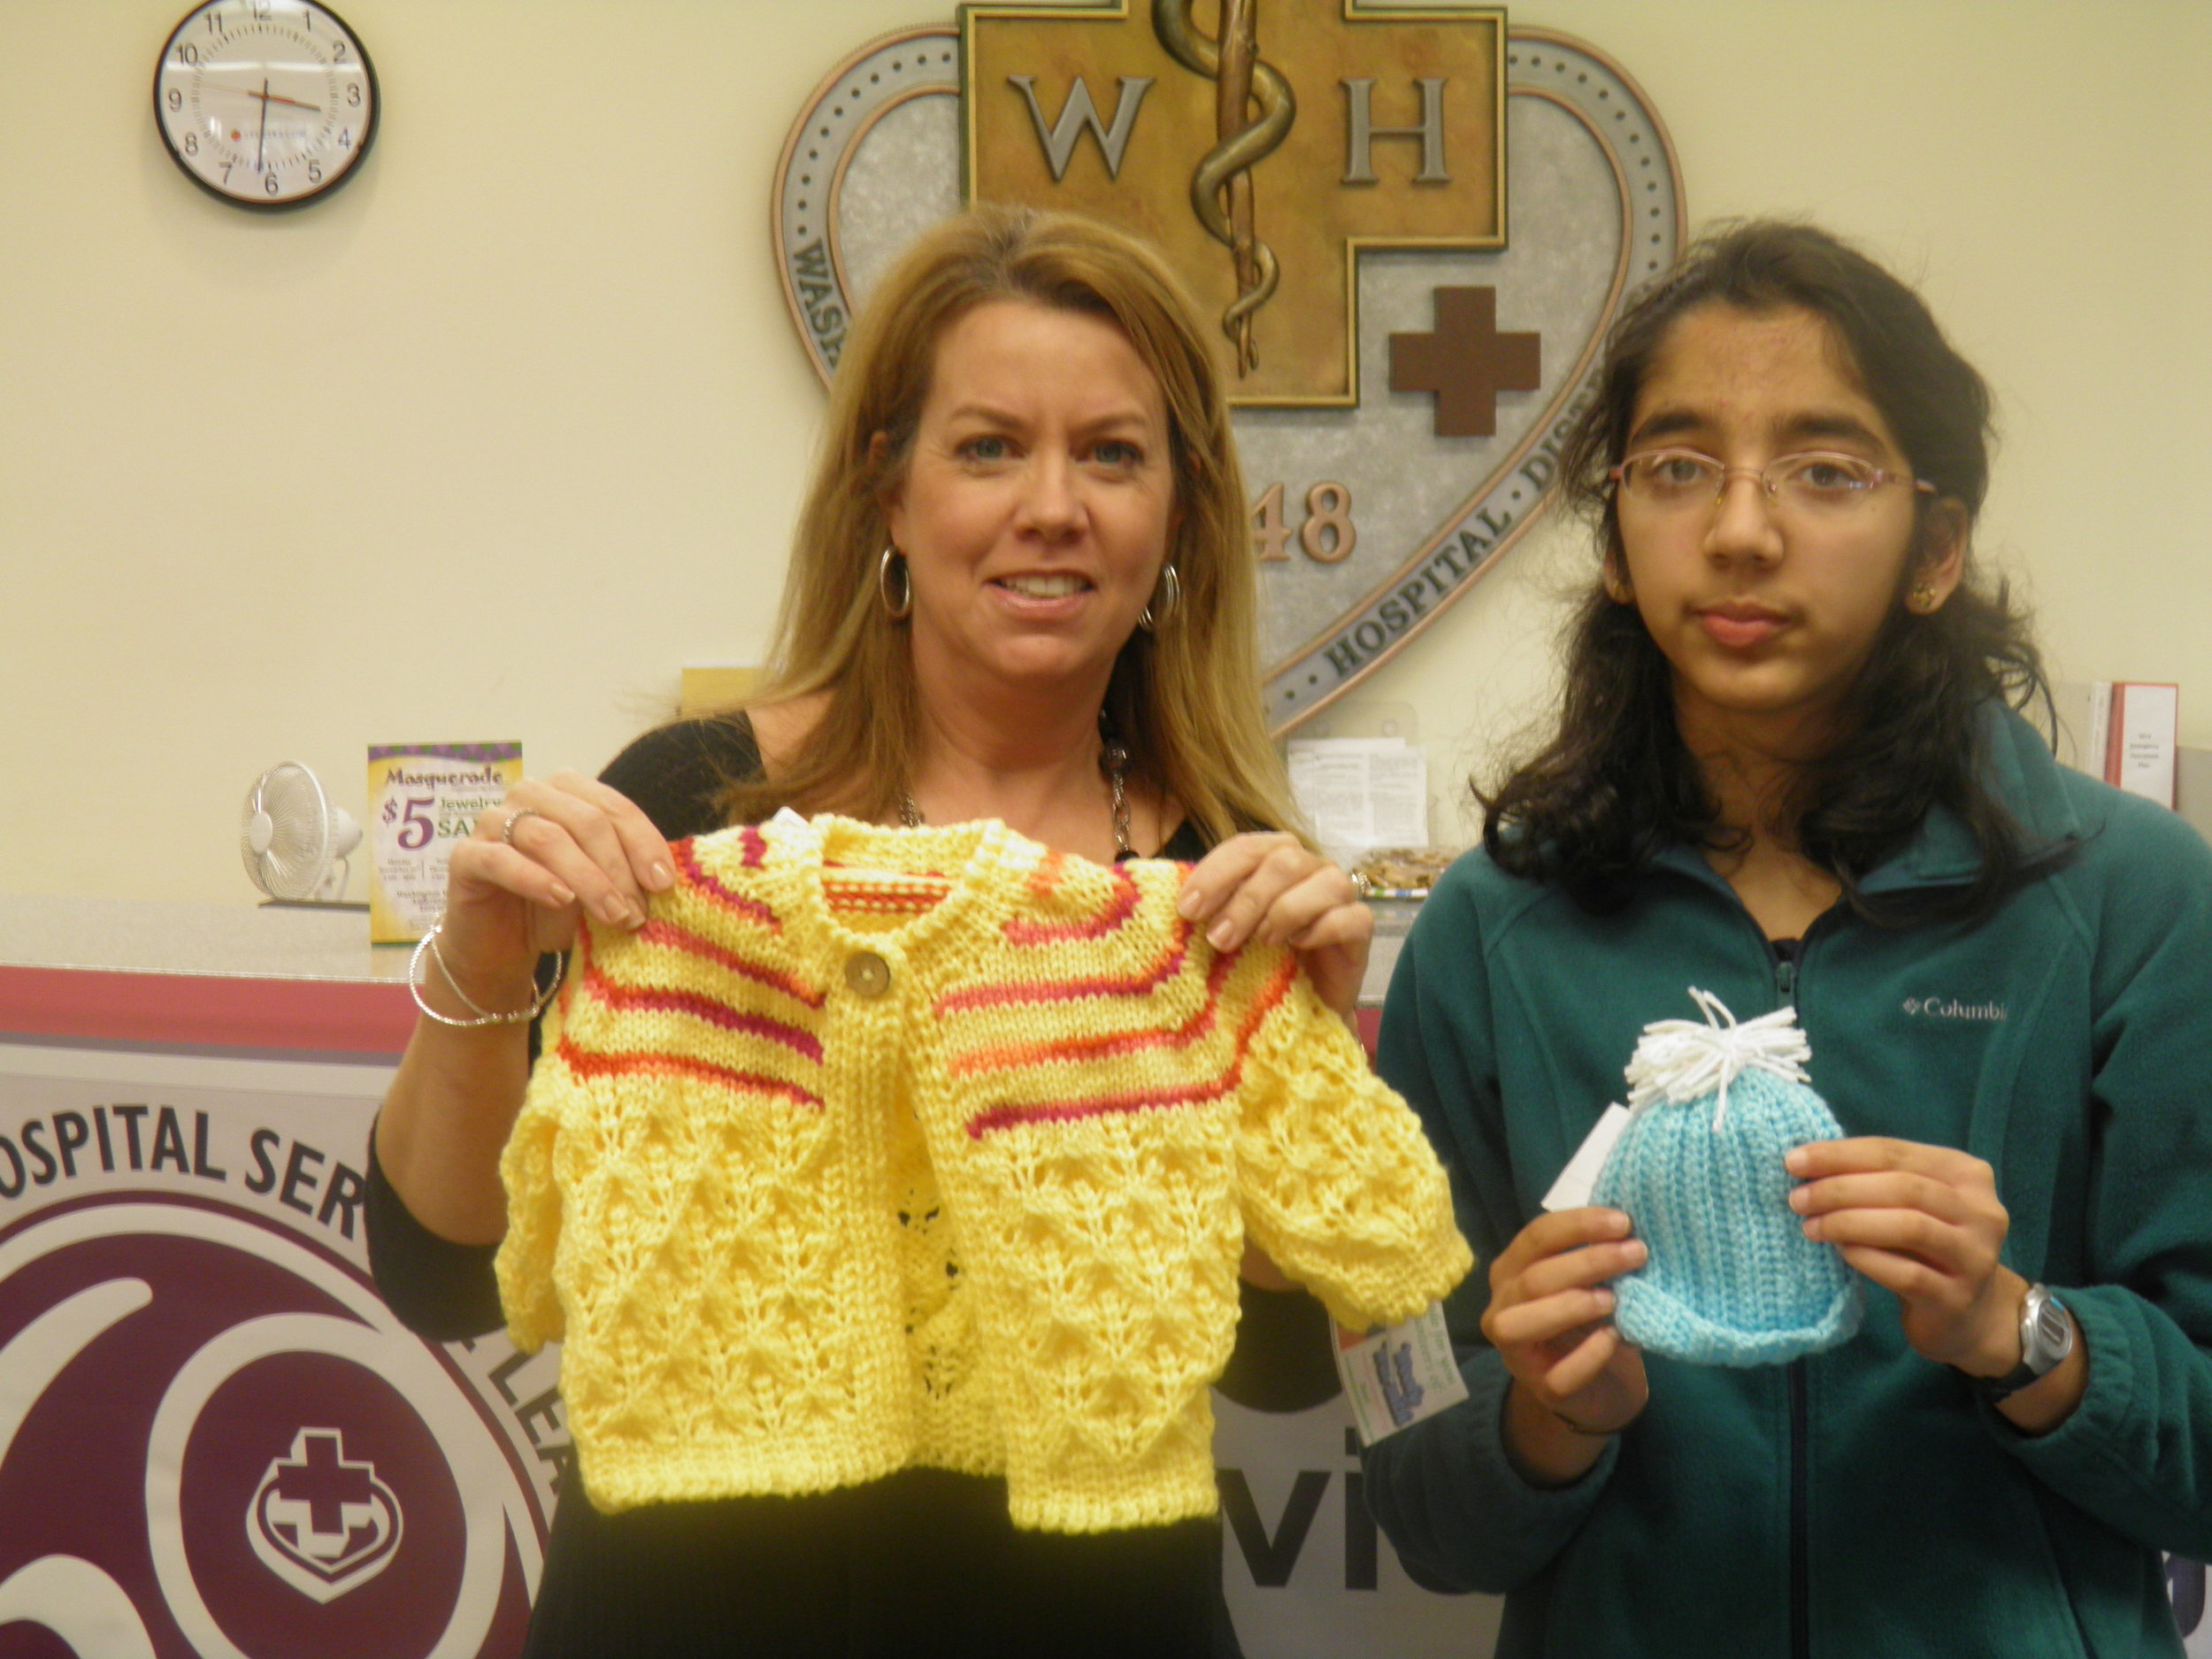 With Ms. Shannon Antepenko, Development Coordinator, Washington Hospital